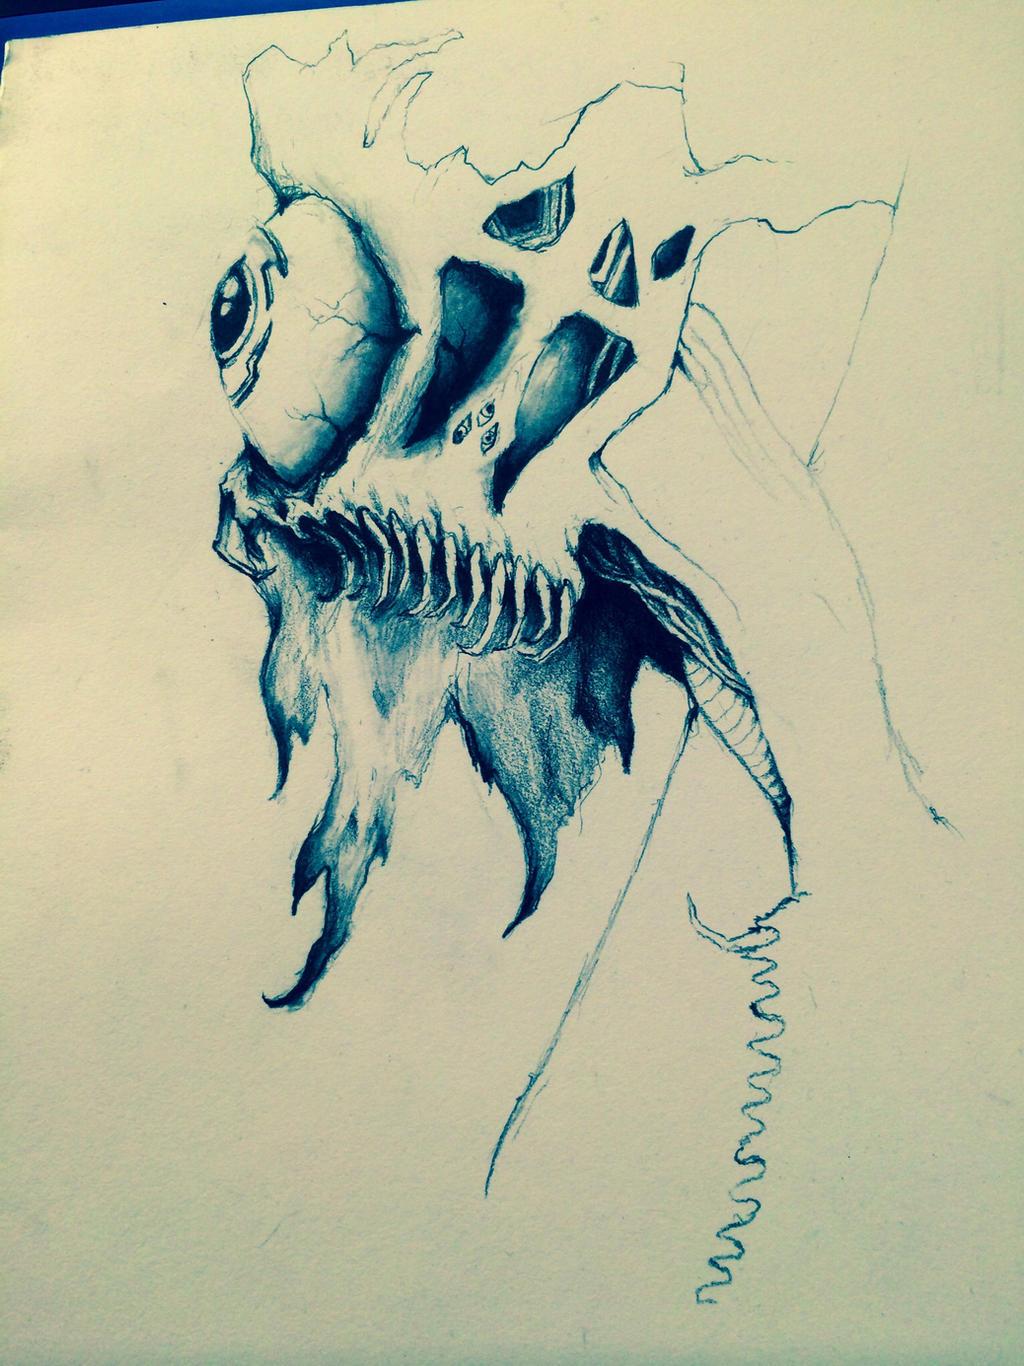 Primordial (update)